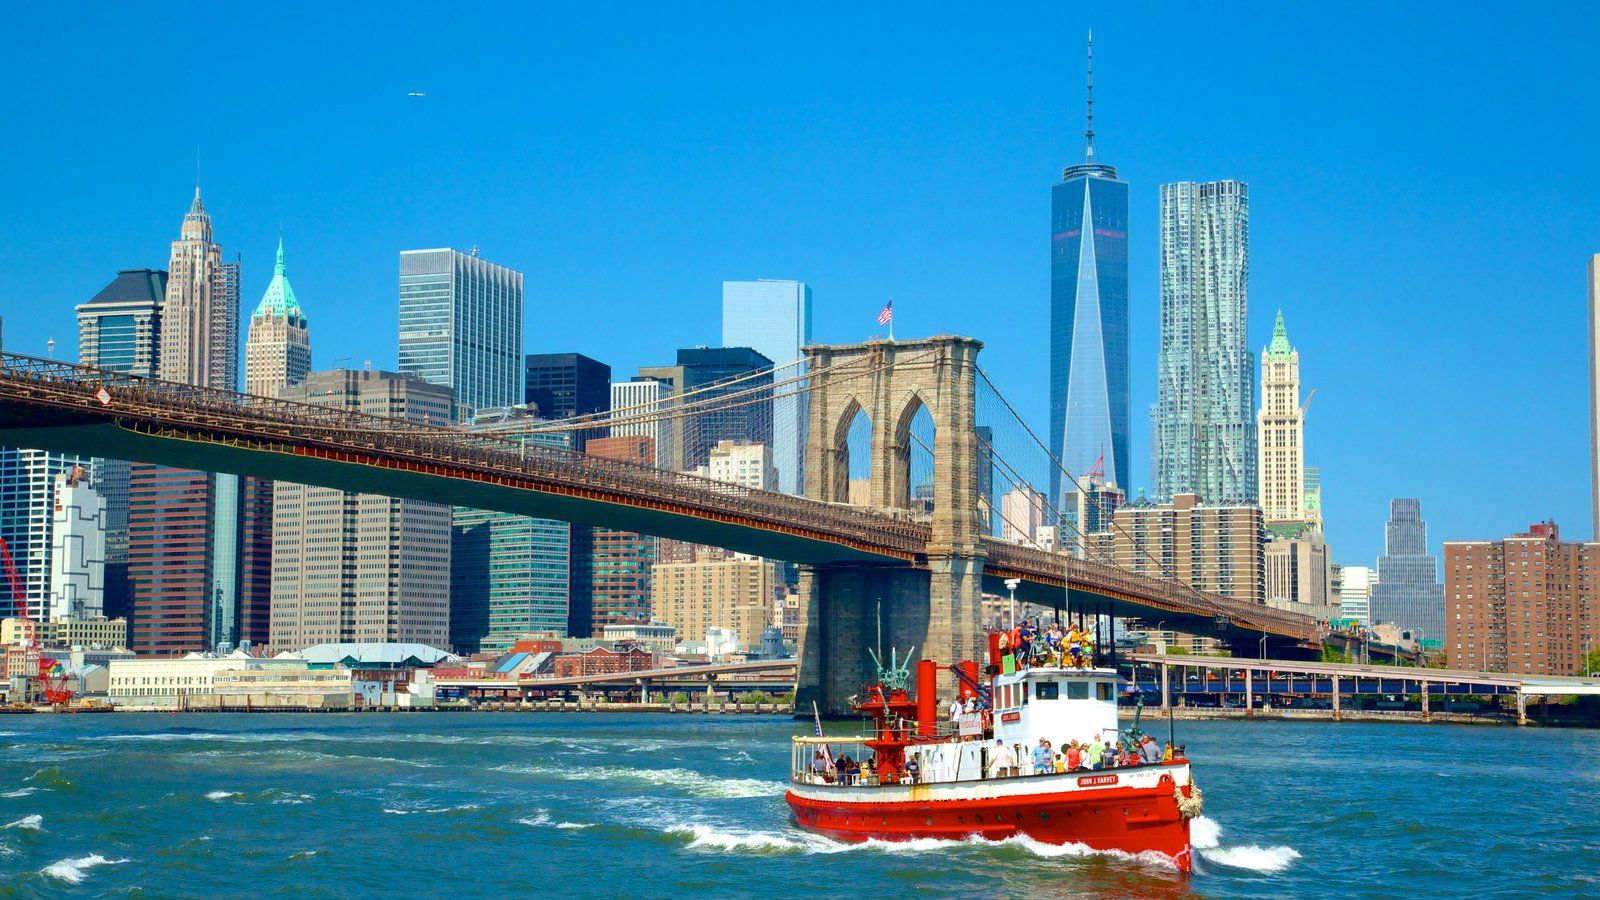 Brooklyn Bridge Pictures: View Photos & Images of Brooklyn Bridge